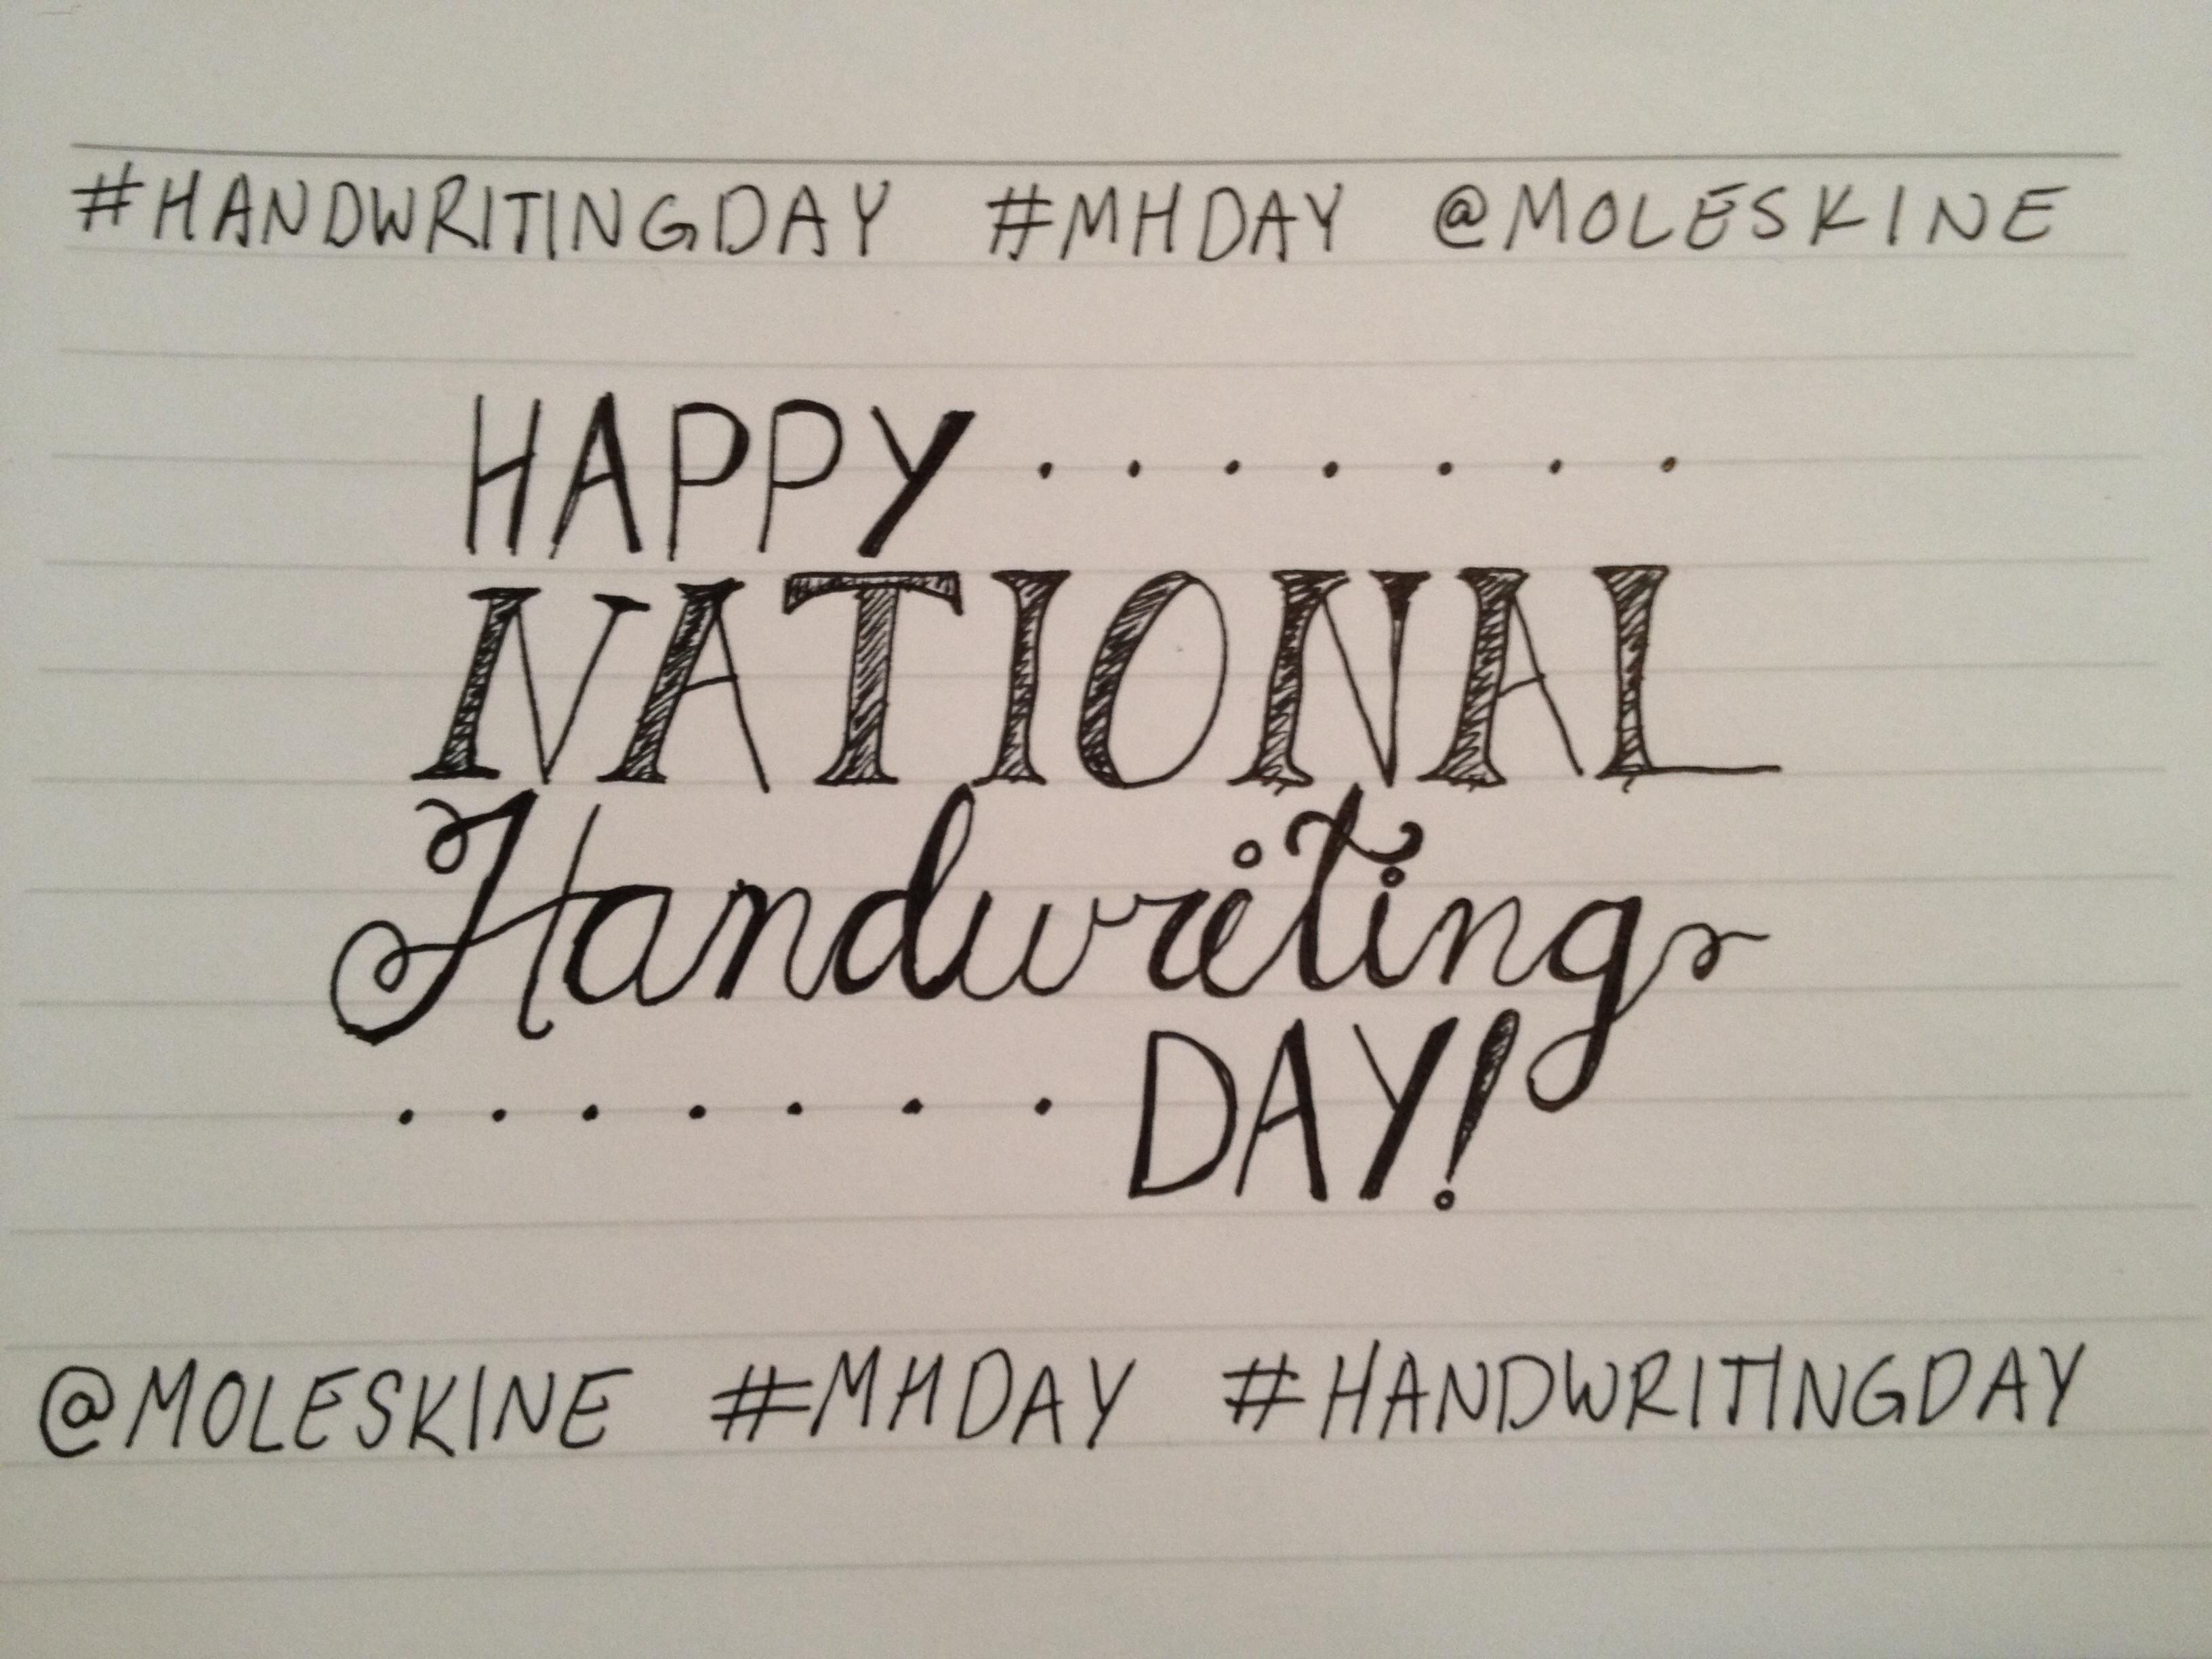 Happy National Handwriting Day!